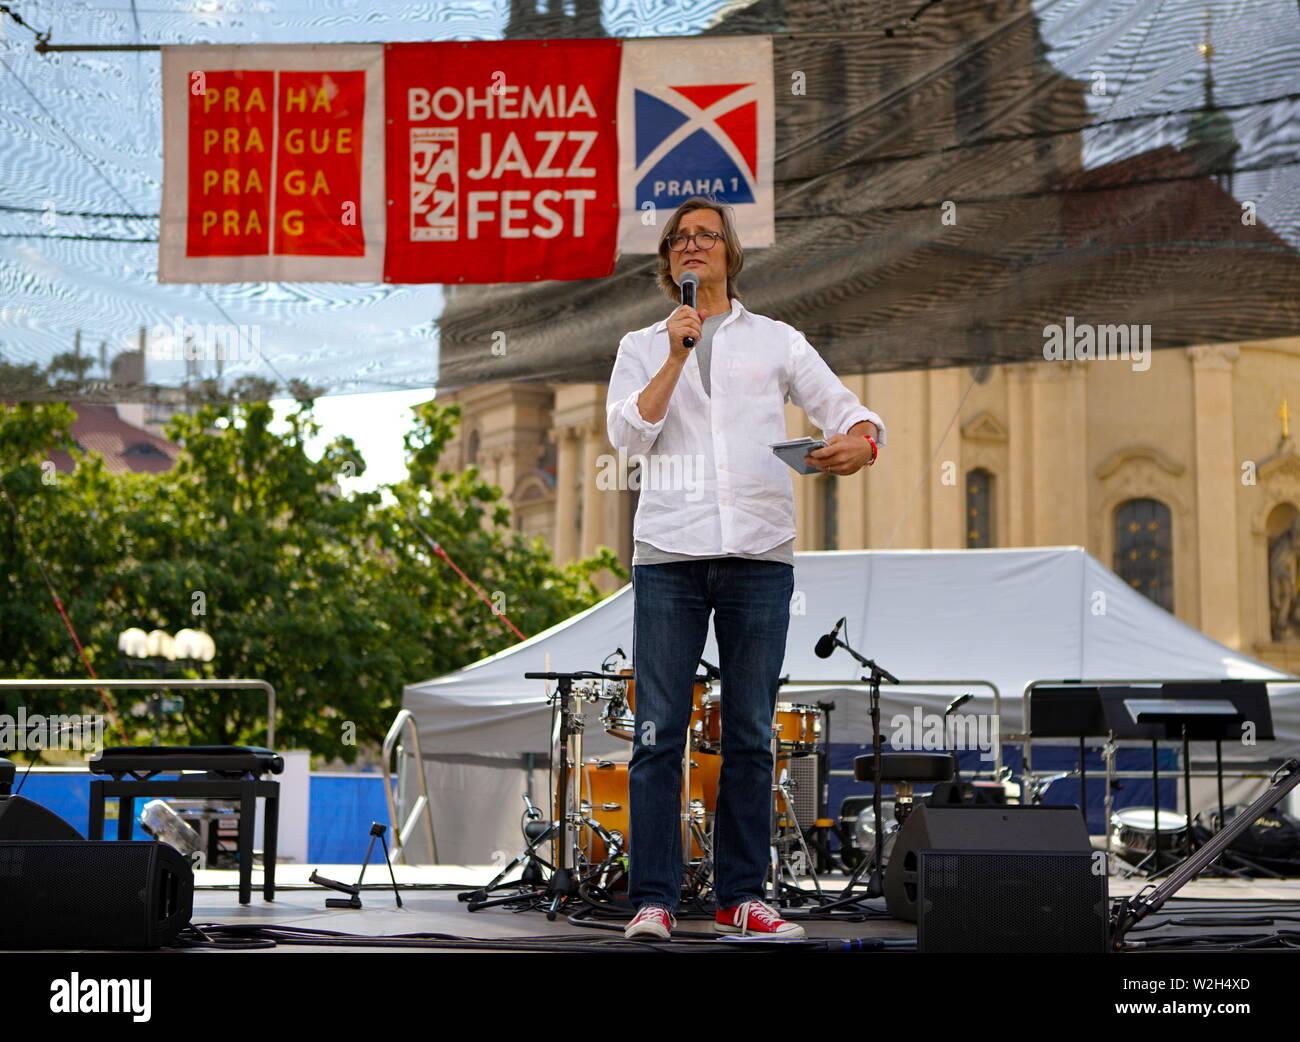 Prague, Czech Republic  8th July, 2019  Rudy Linka, founder